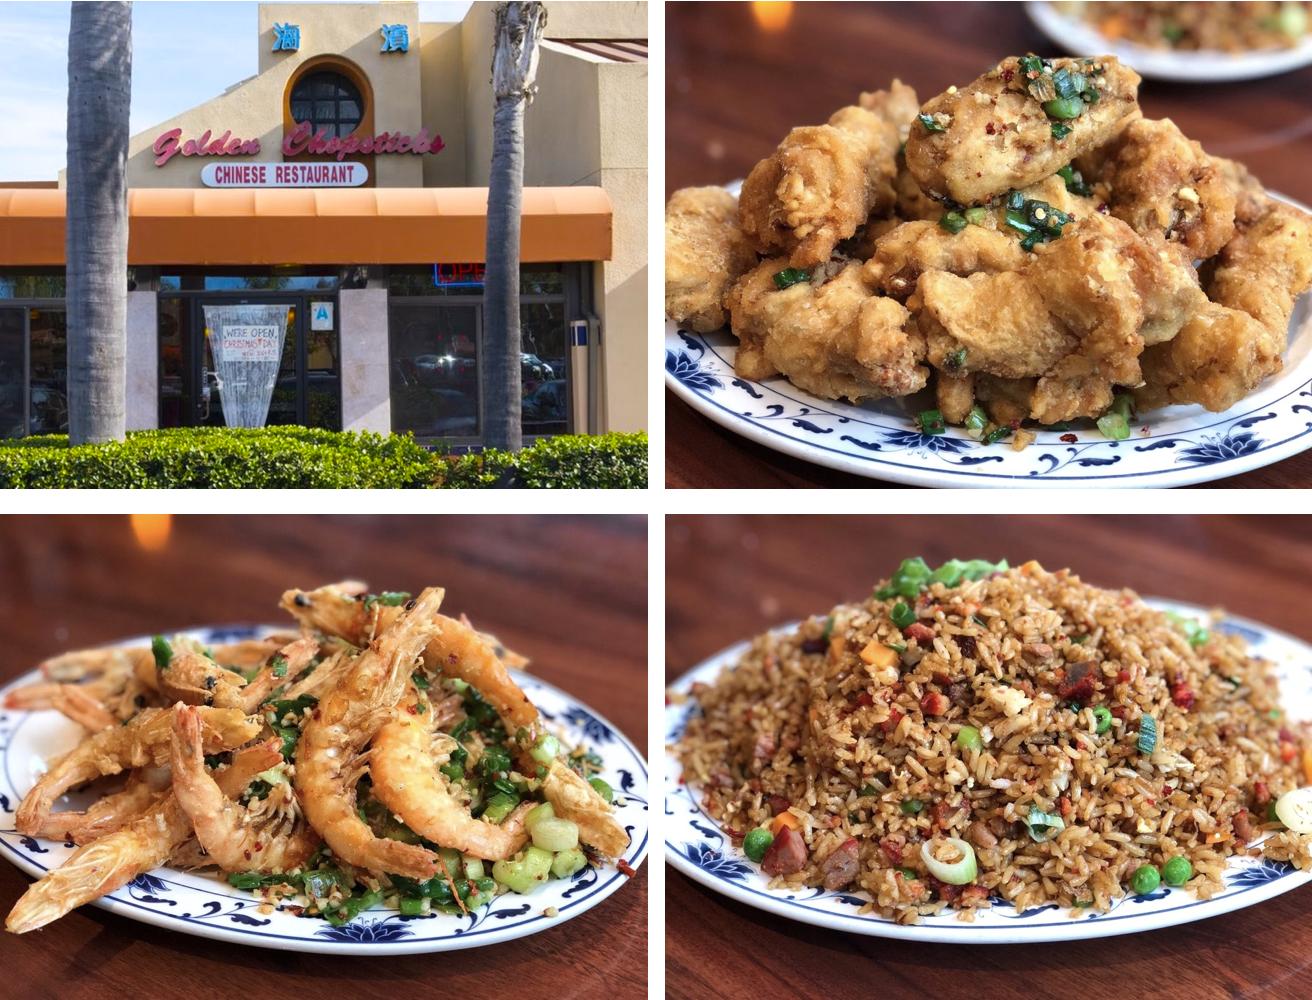 SanDiegoVille: San Diego Chinese Food Destination Golden Chopsticks To Expand To Mira Mesa